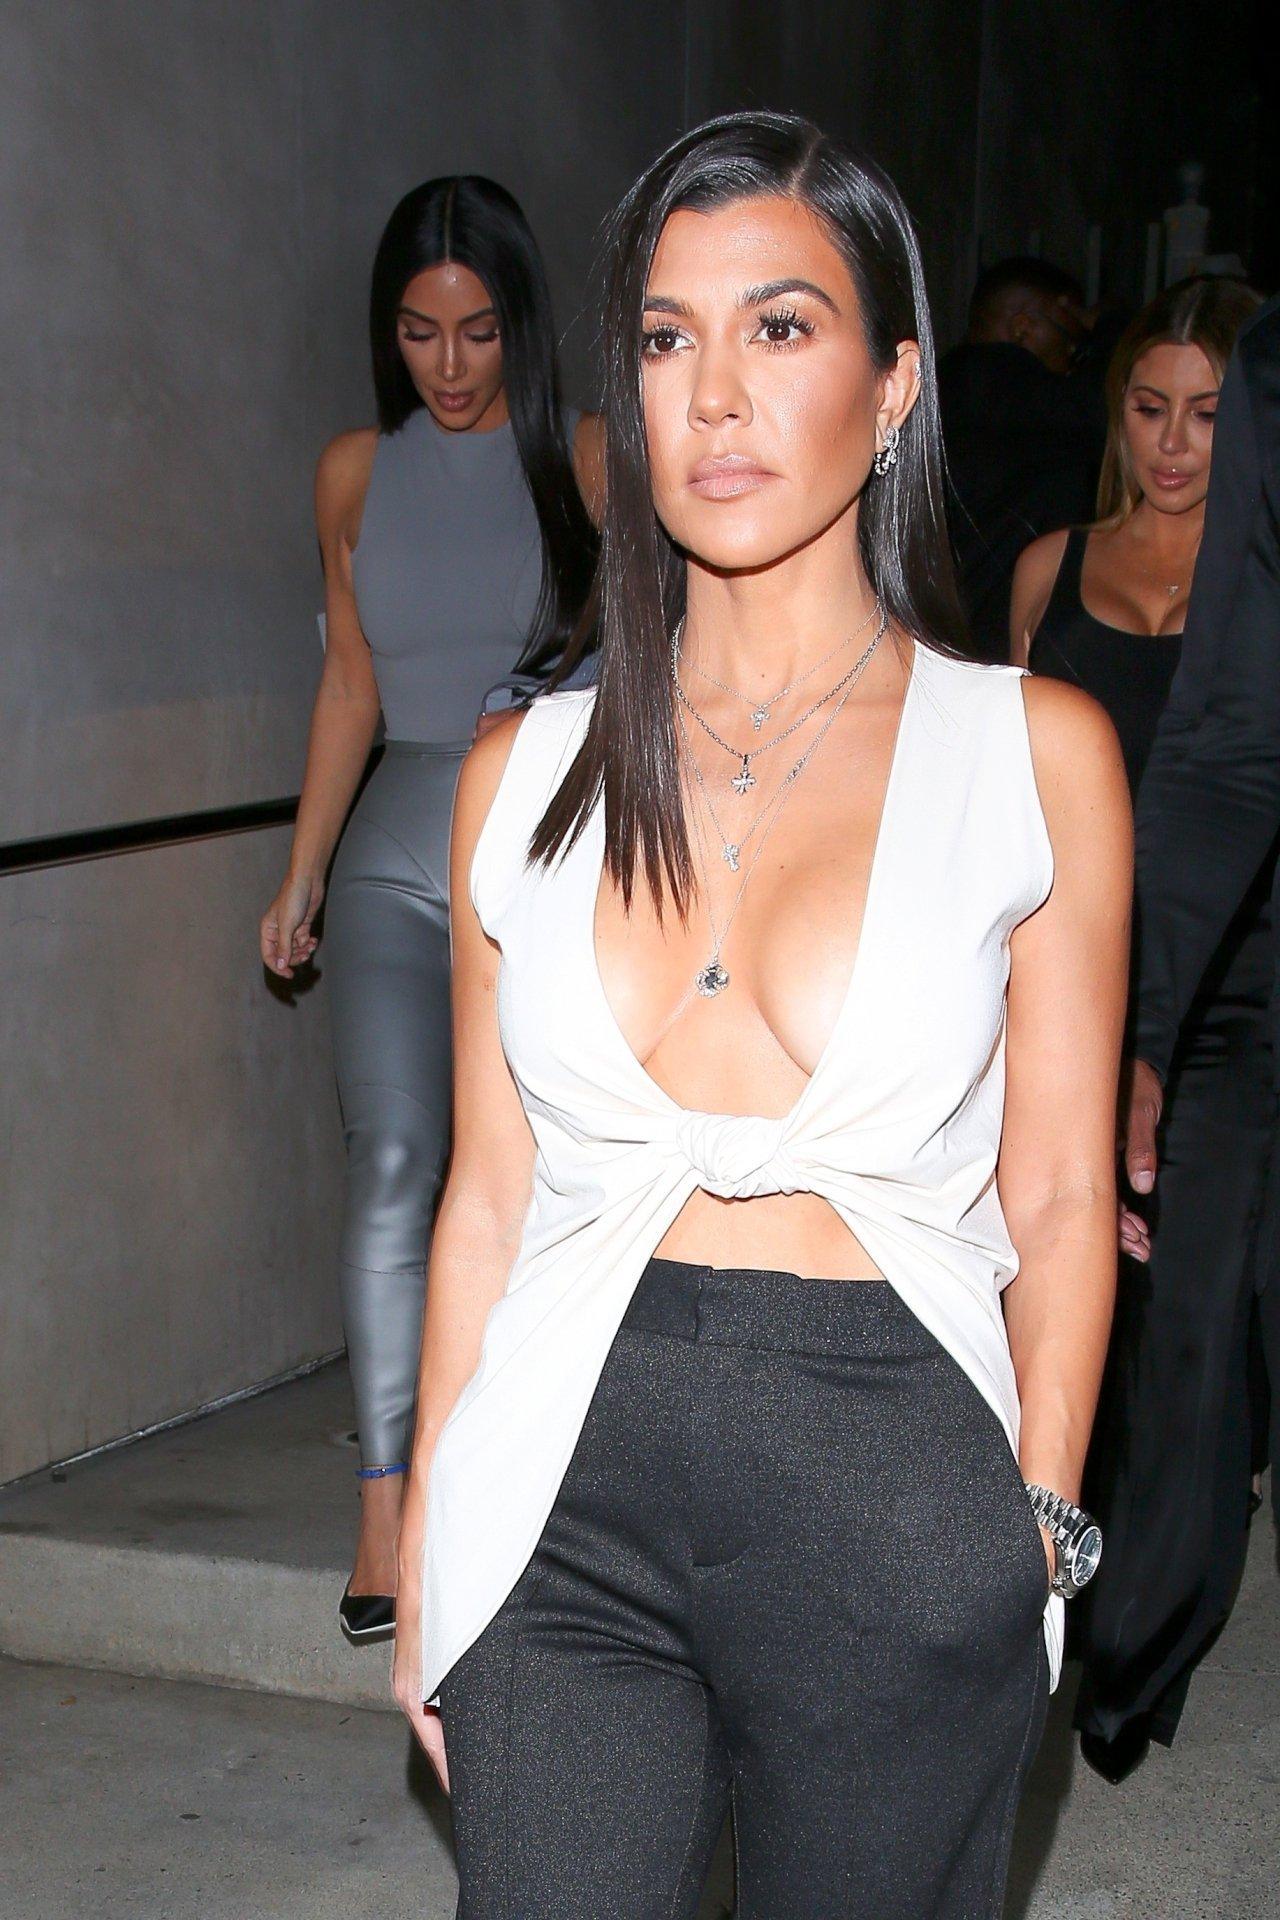 Watch Kourtney Kardashian braless video